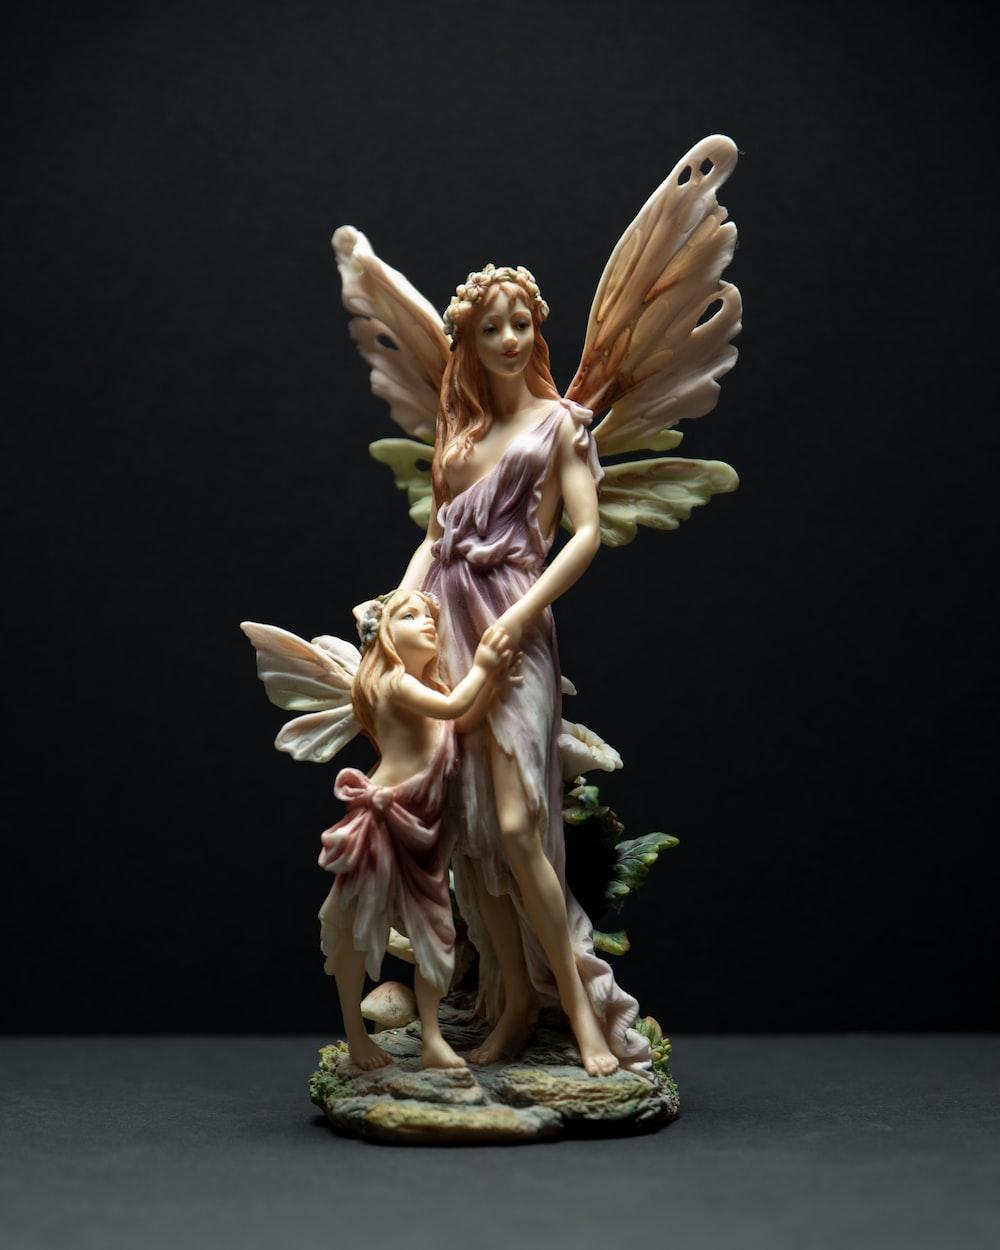 angel holding flowers ceramic figurine